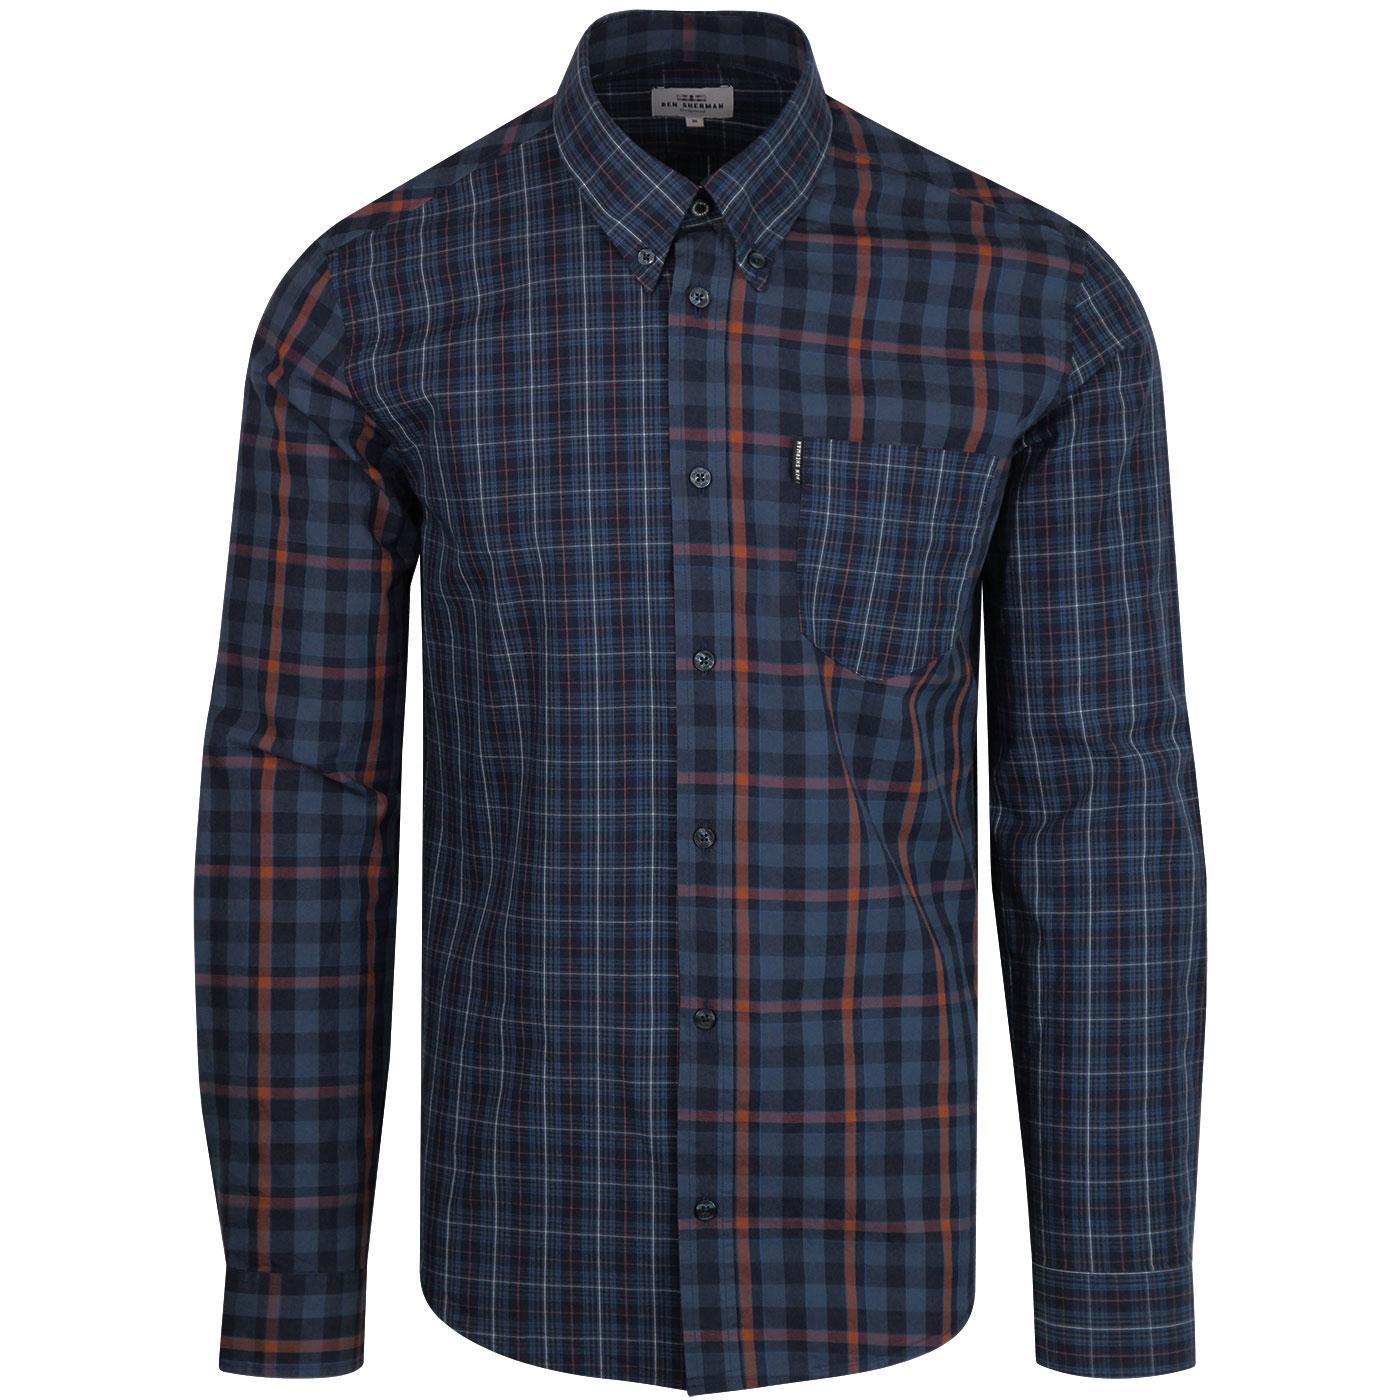 BEN SHERMAN Men's Retro Mixed Gingham Check Shirt